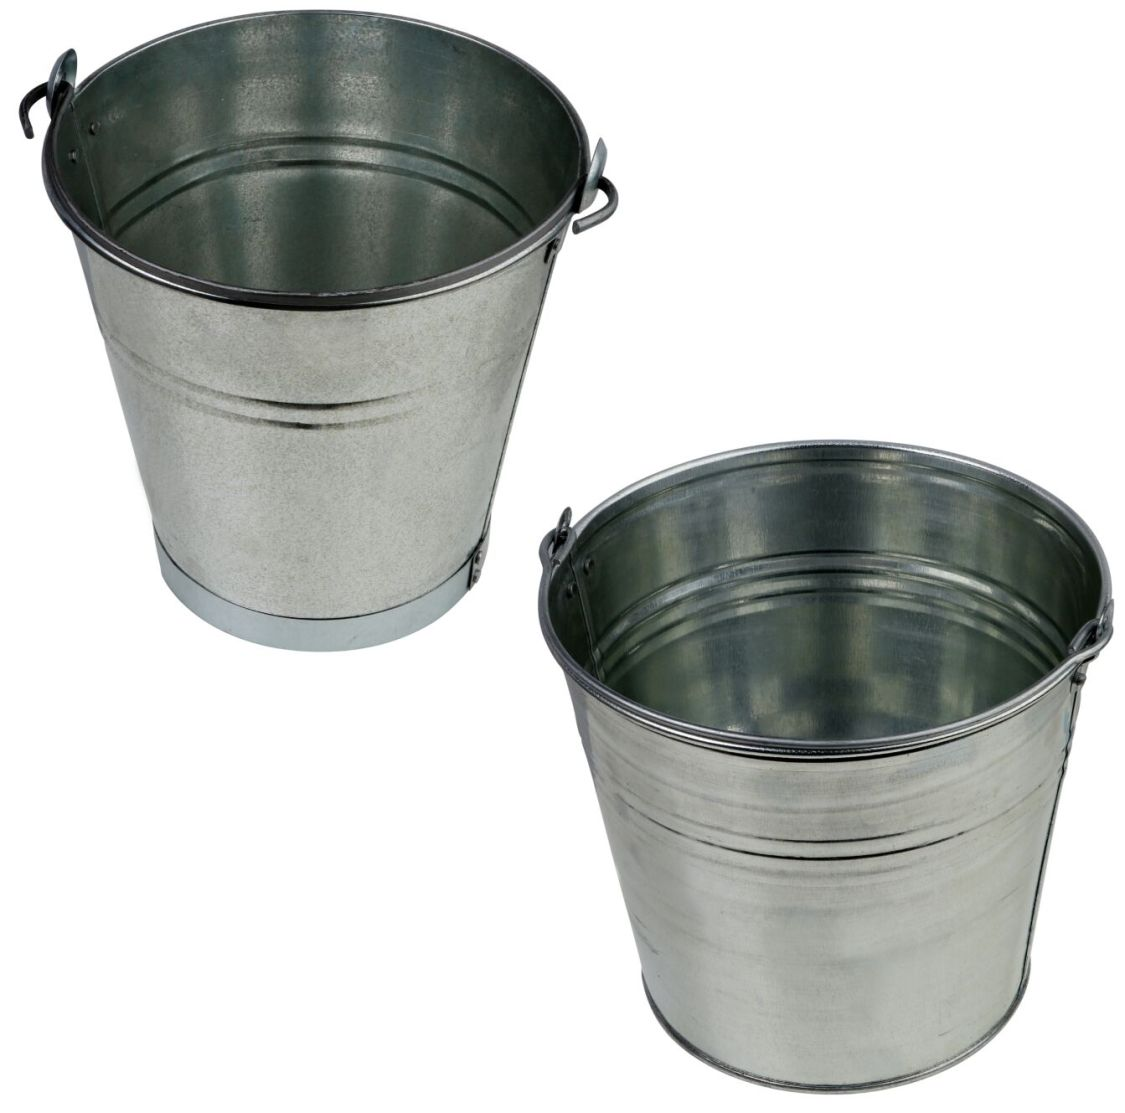 Zinkeimer Blecheimer verzinkt 5-15 Liter Wassereimer Metalleimer Dekoeimer T1